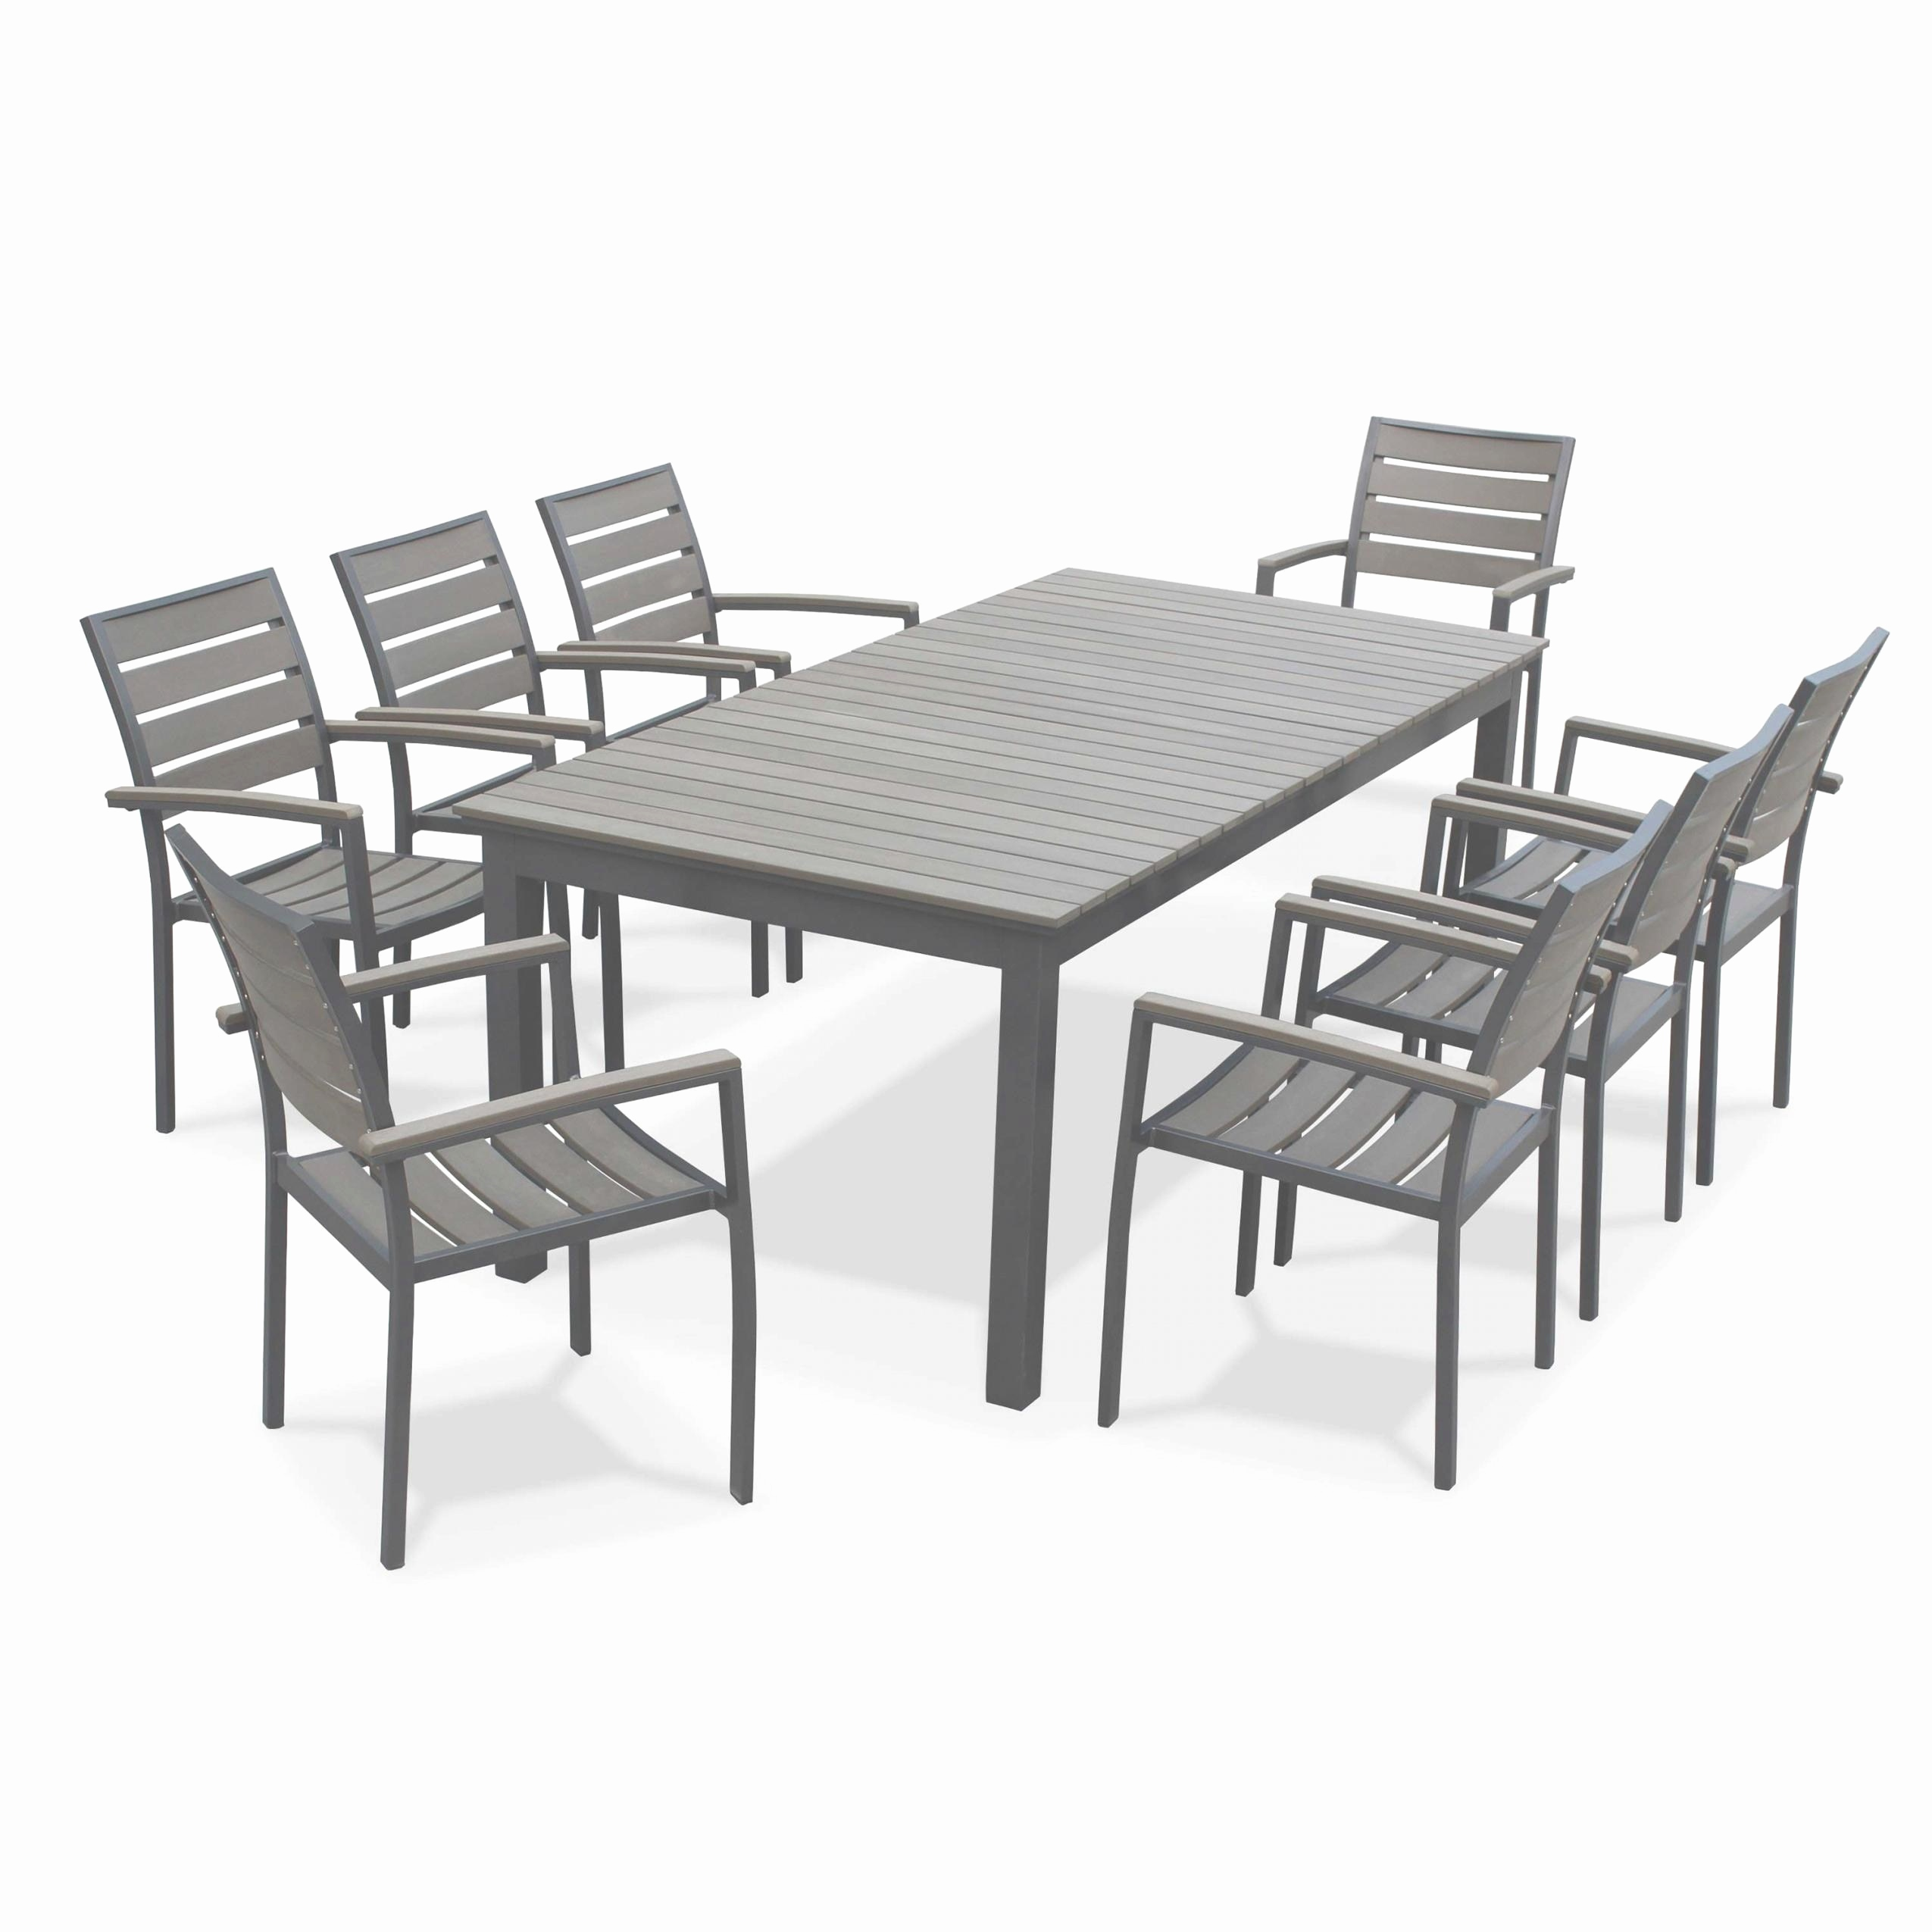 salon de jardin en teck pas cher moderne chaise salon de jardin aluminium best petite table exterieur pas of salon de jardin en teck pas cher